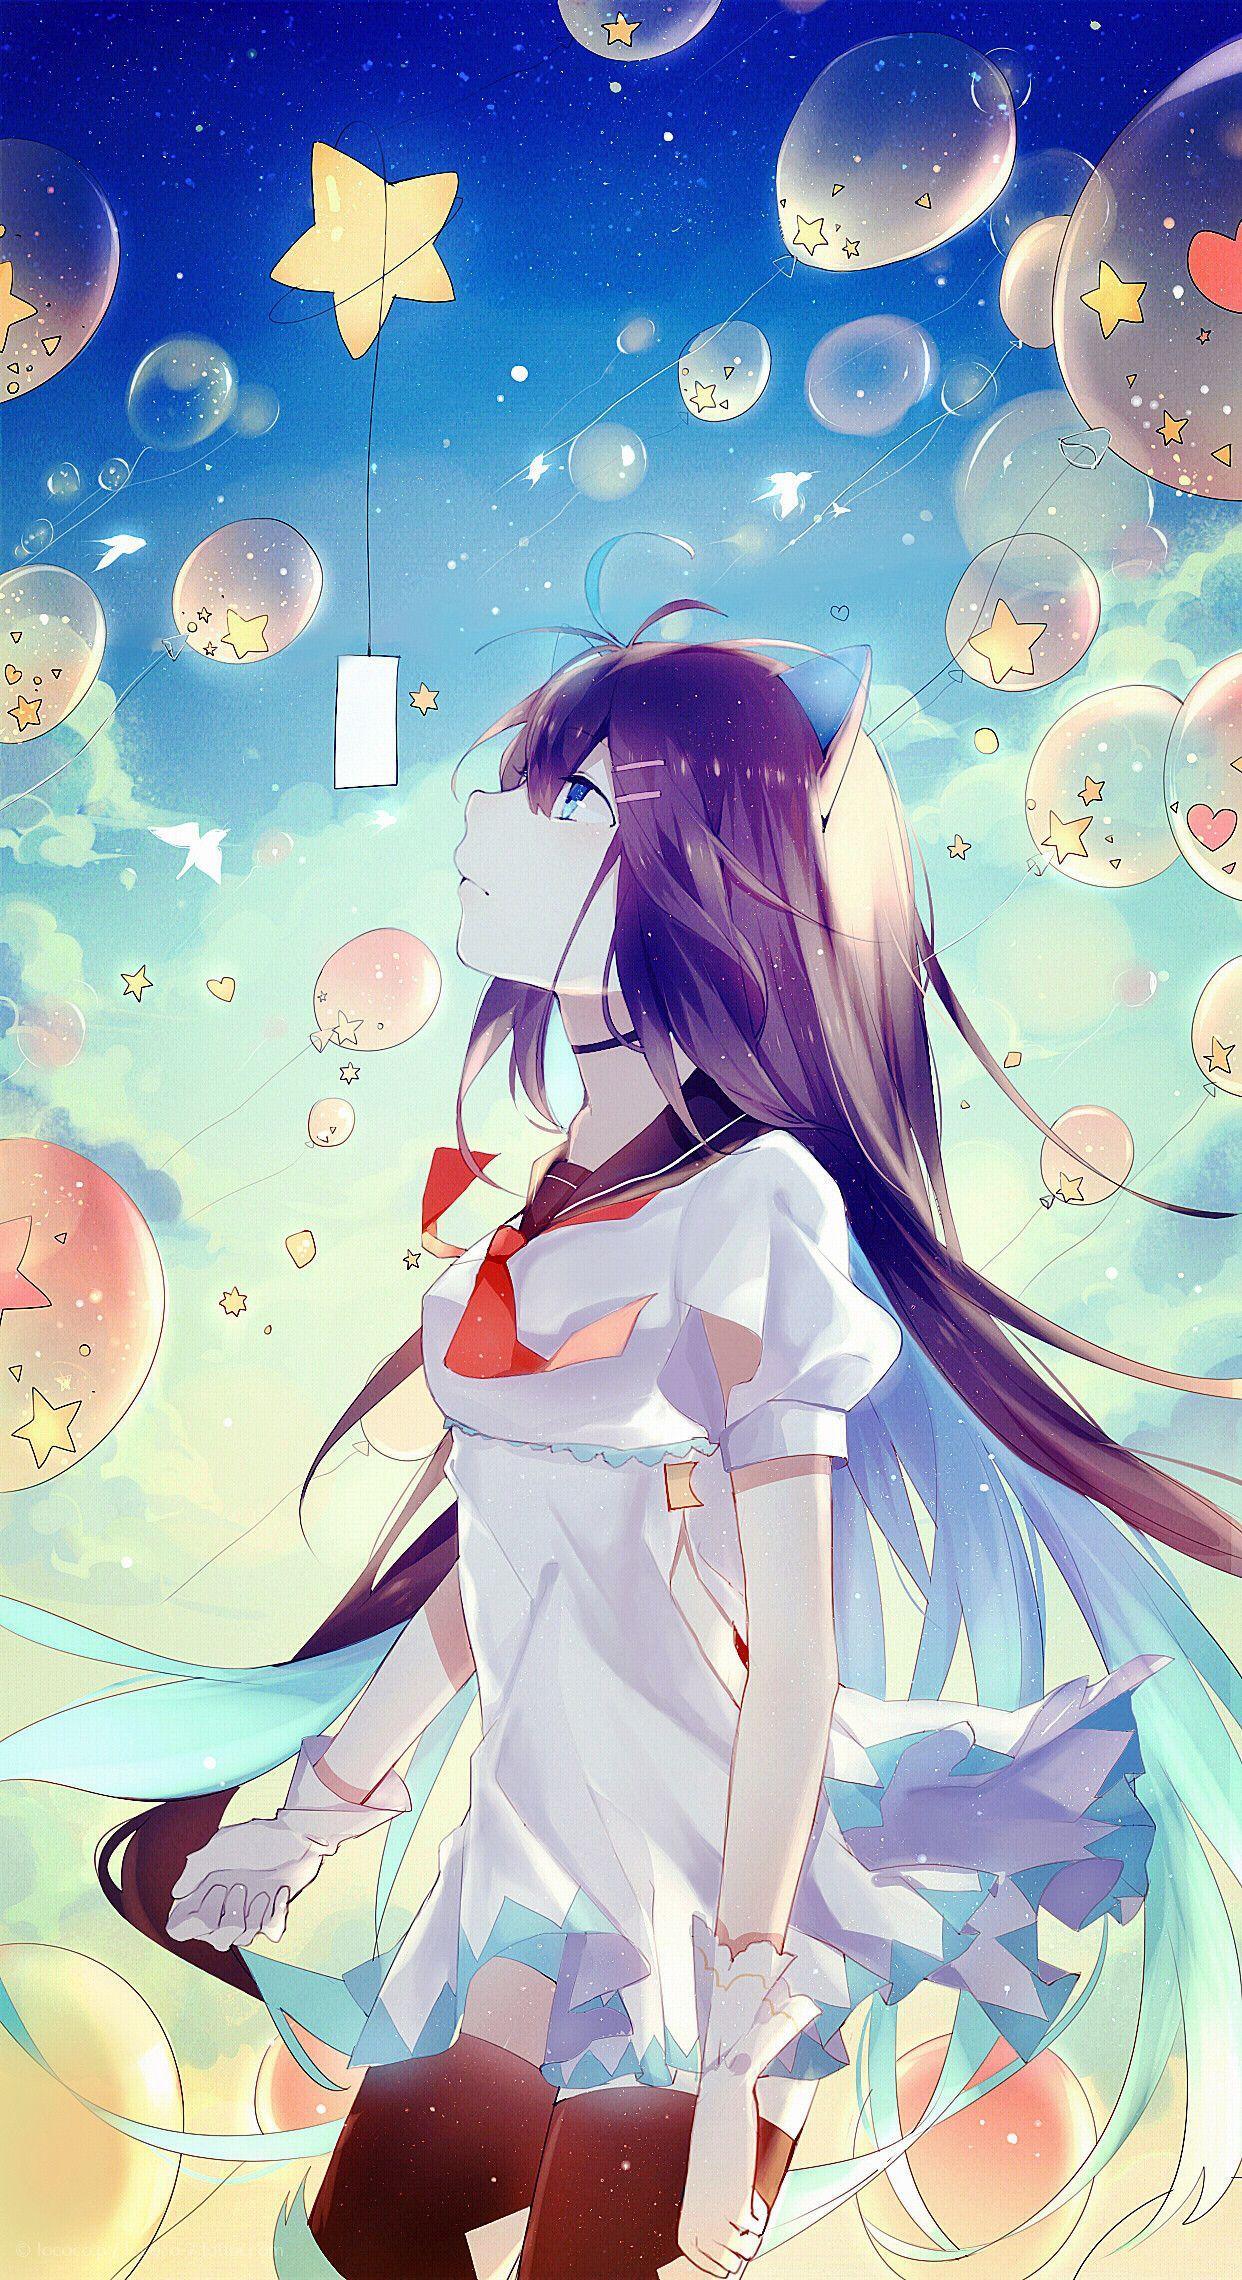 Art By Lococo P Digital Art Anime Anime Art Girl Anime Scenery